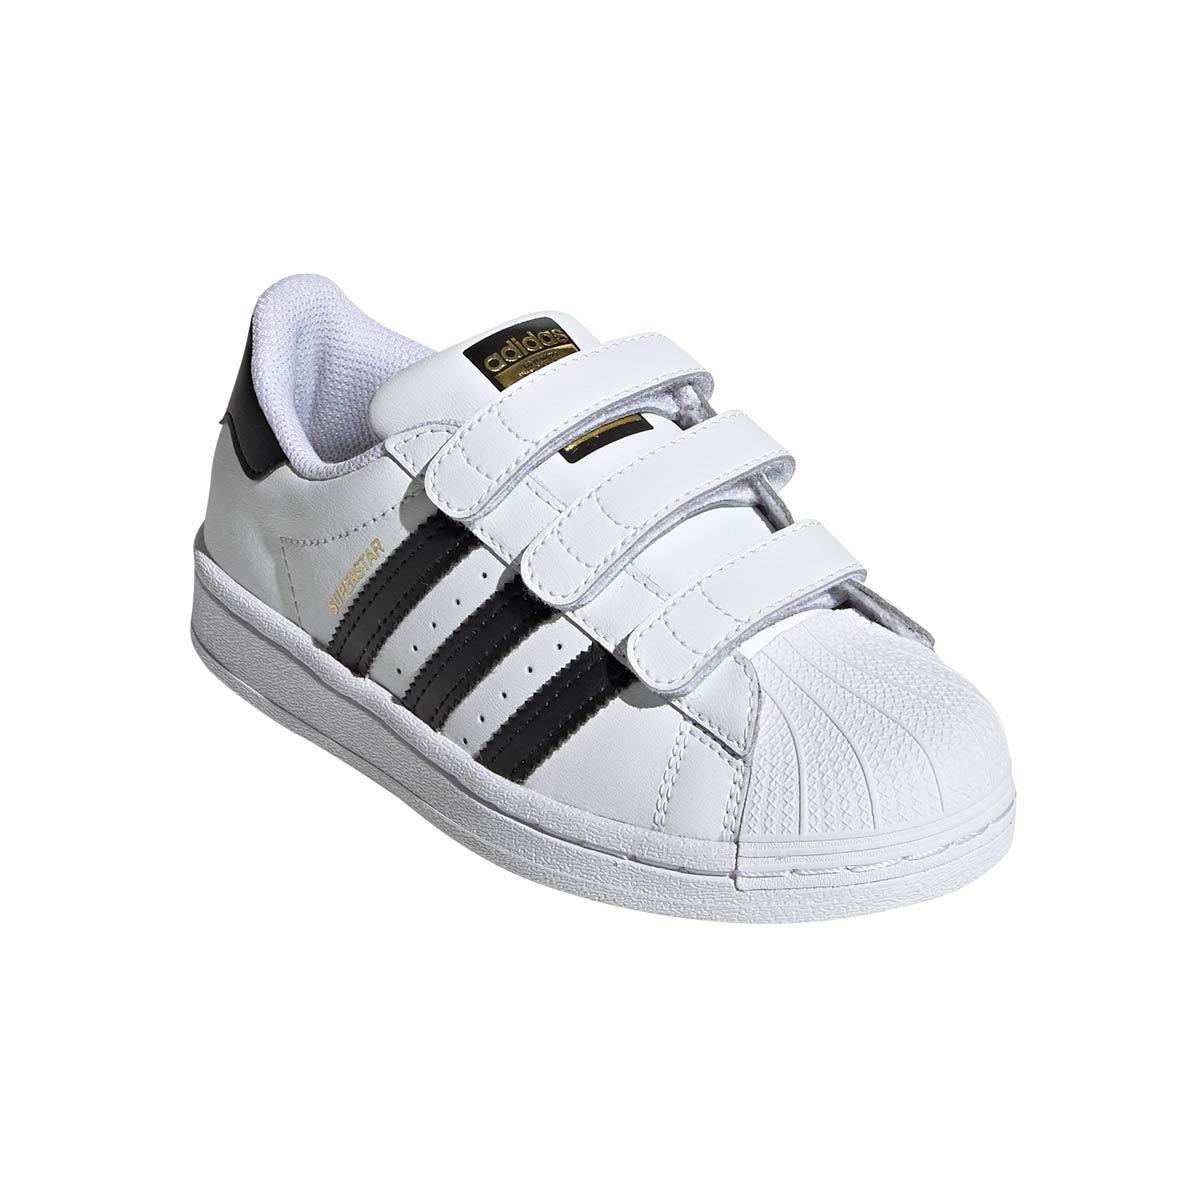 Tenis-Infantil-Adidas-Superstar--26-ao-32-